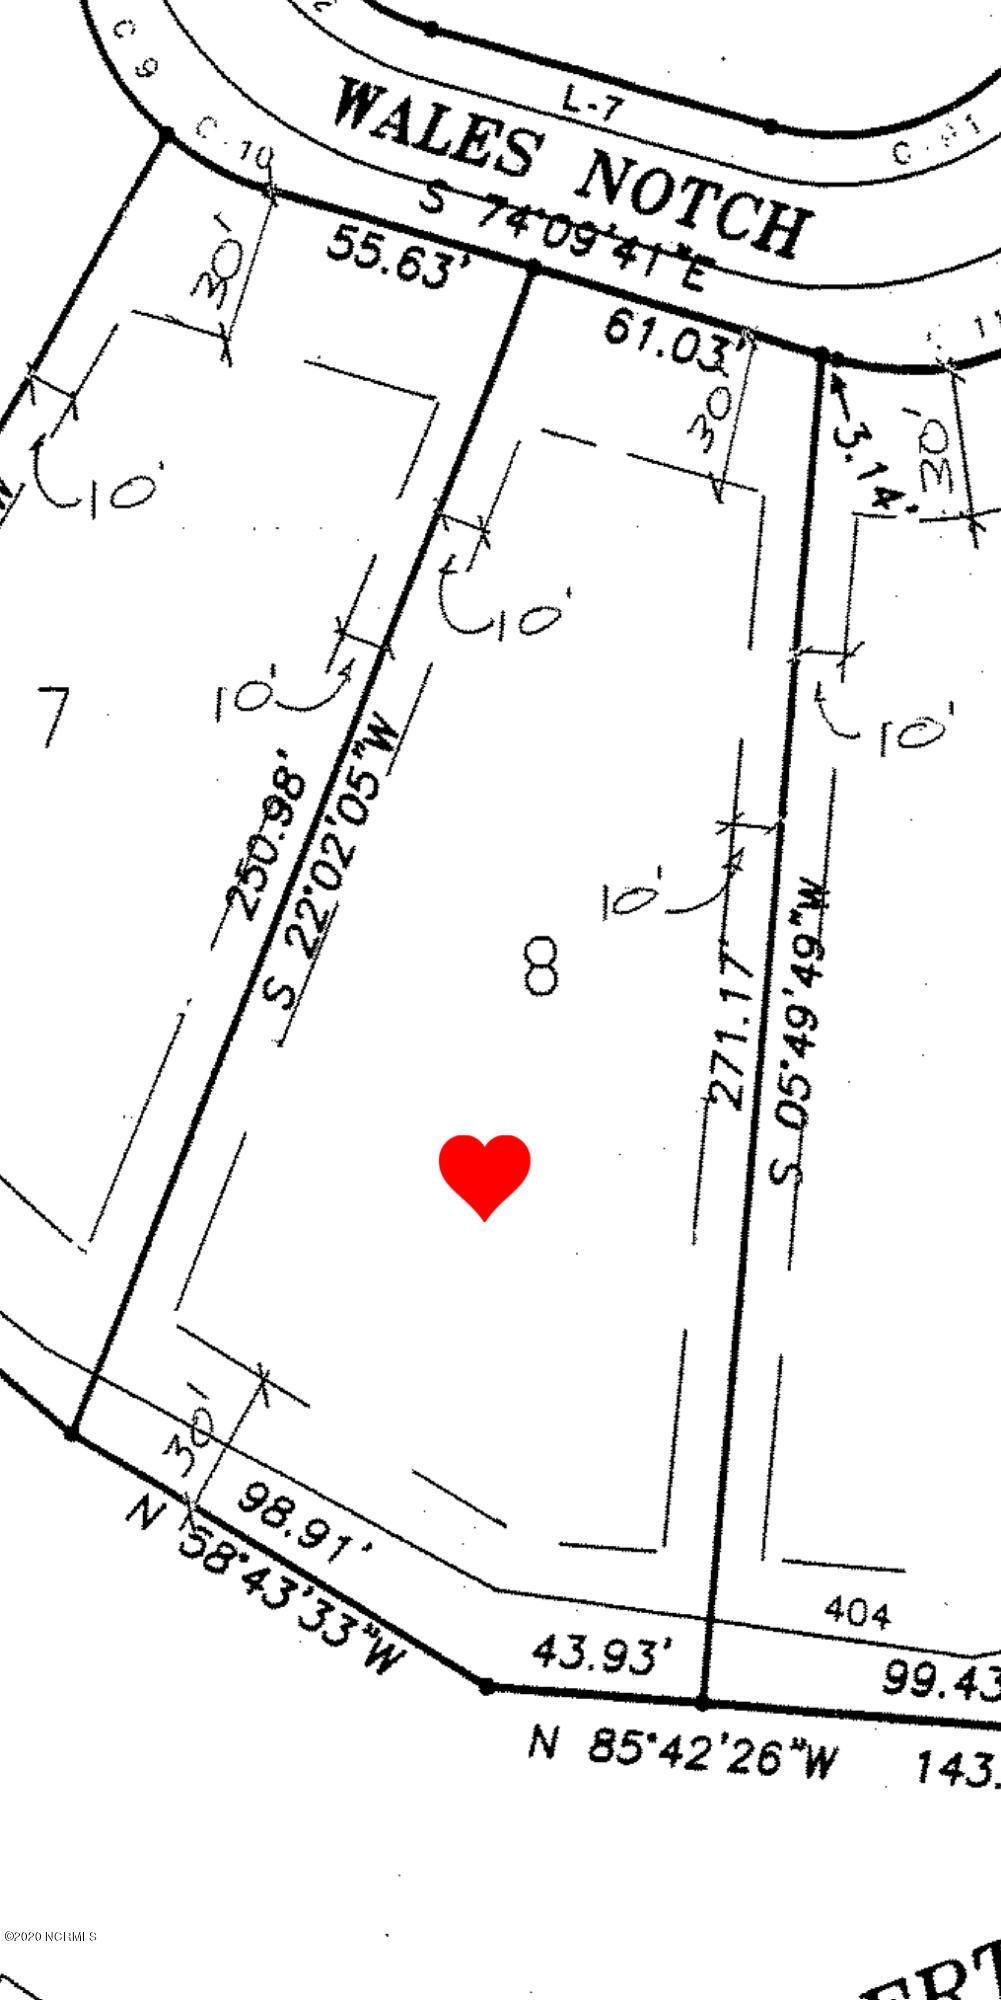 545 Wales Notch, Ocean Isle Beach, North Carolina 28469, ,Residential land,For sale,Wales Notch,100239070